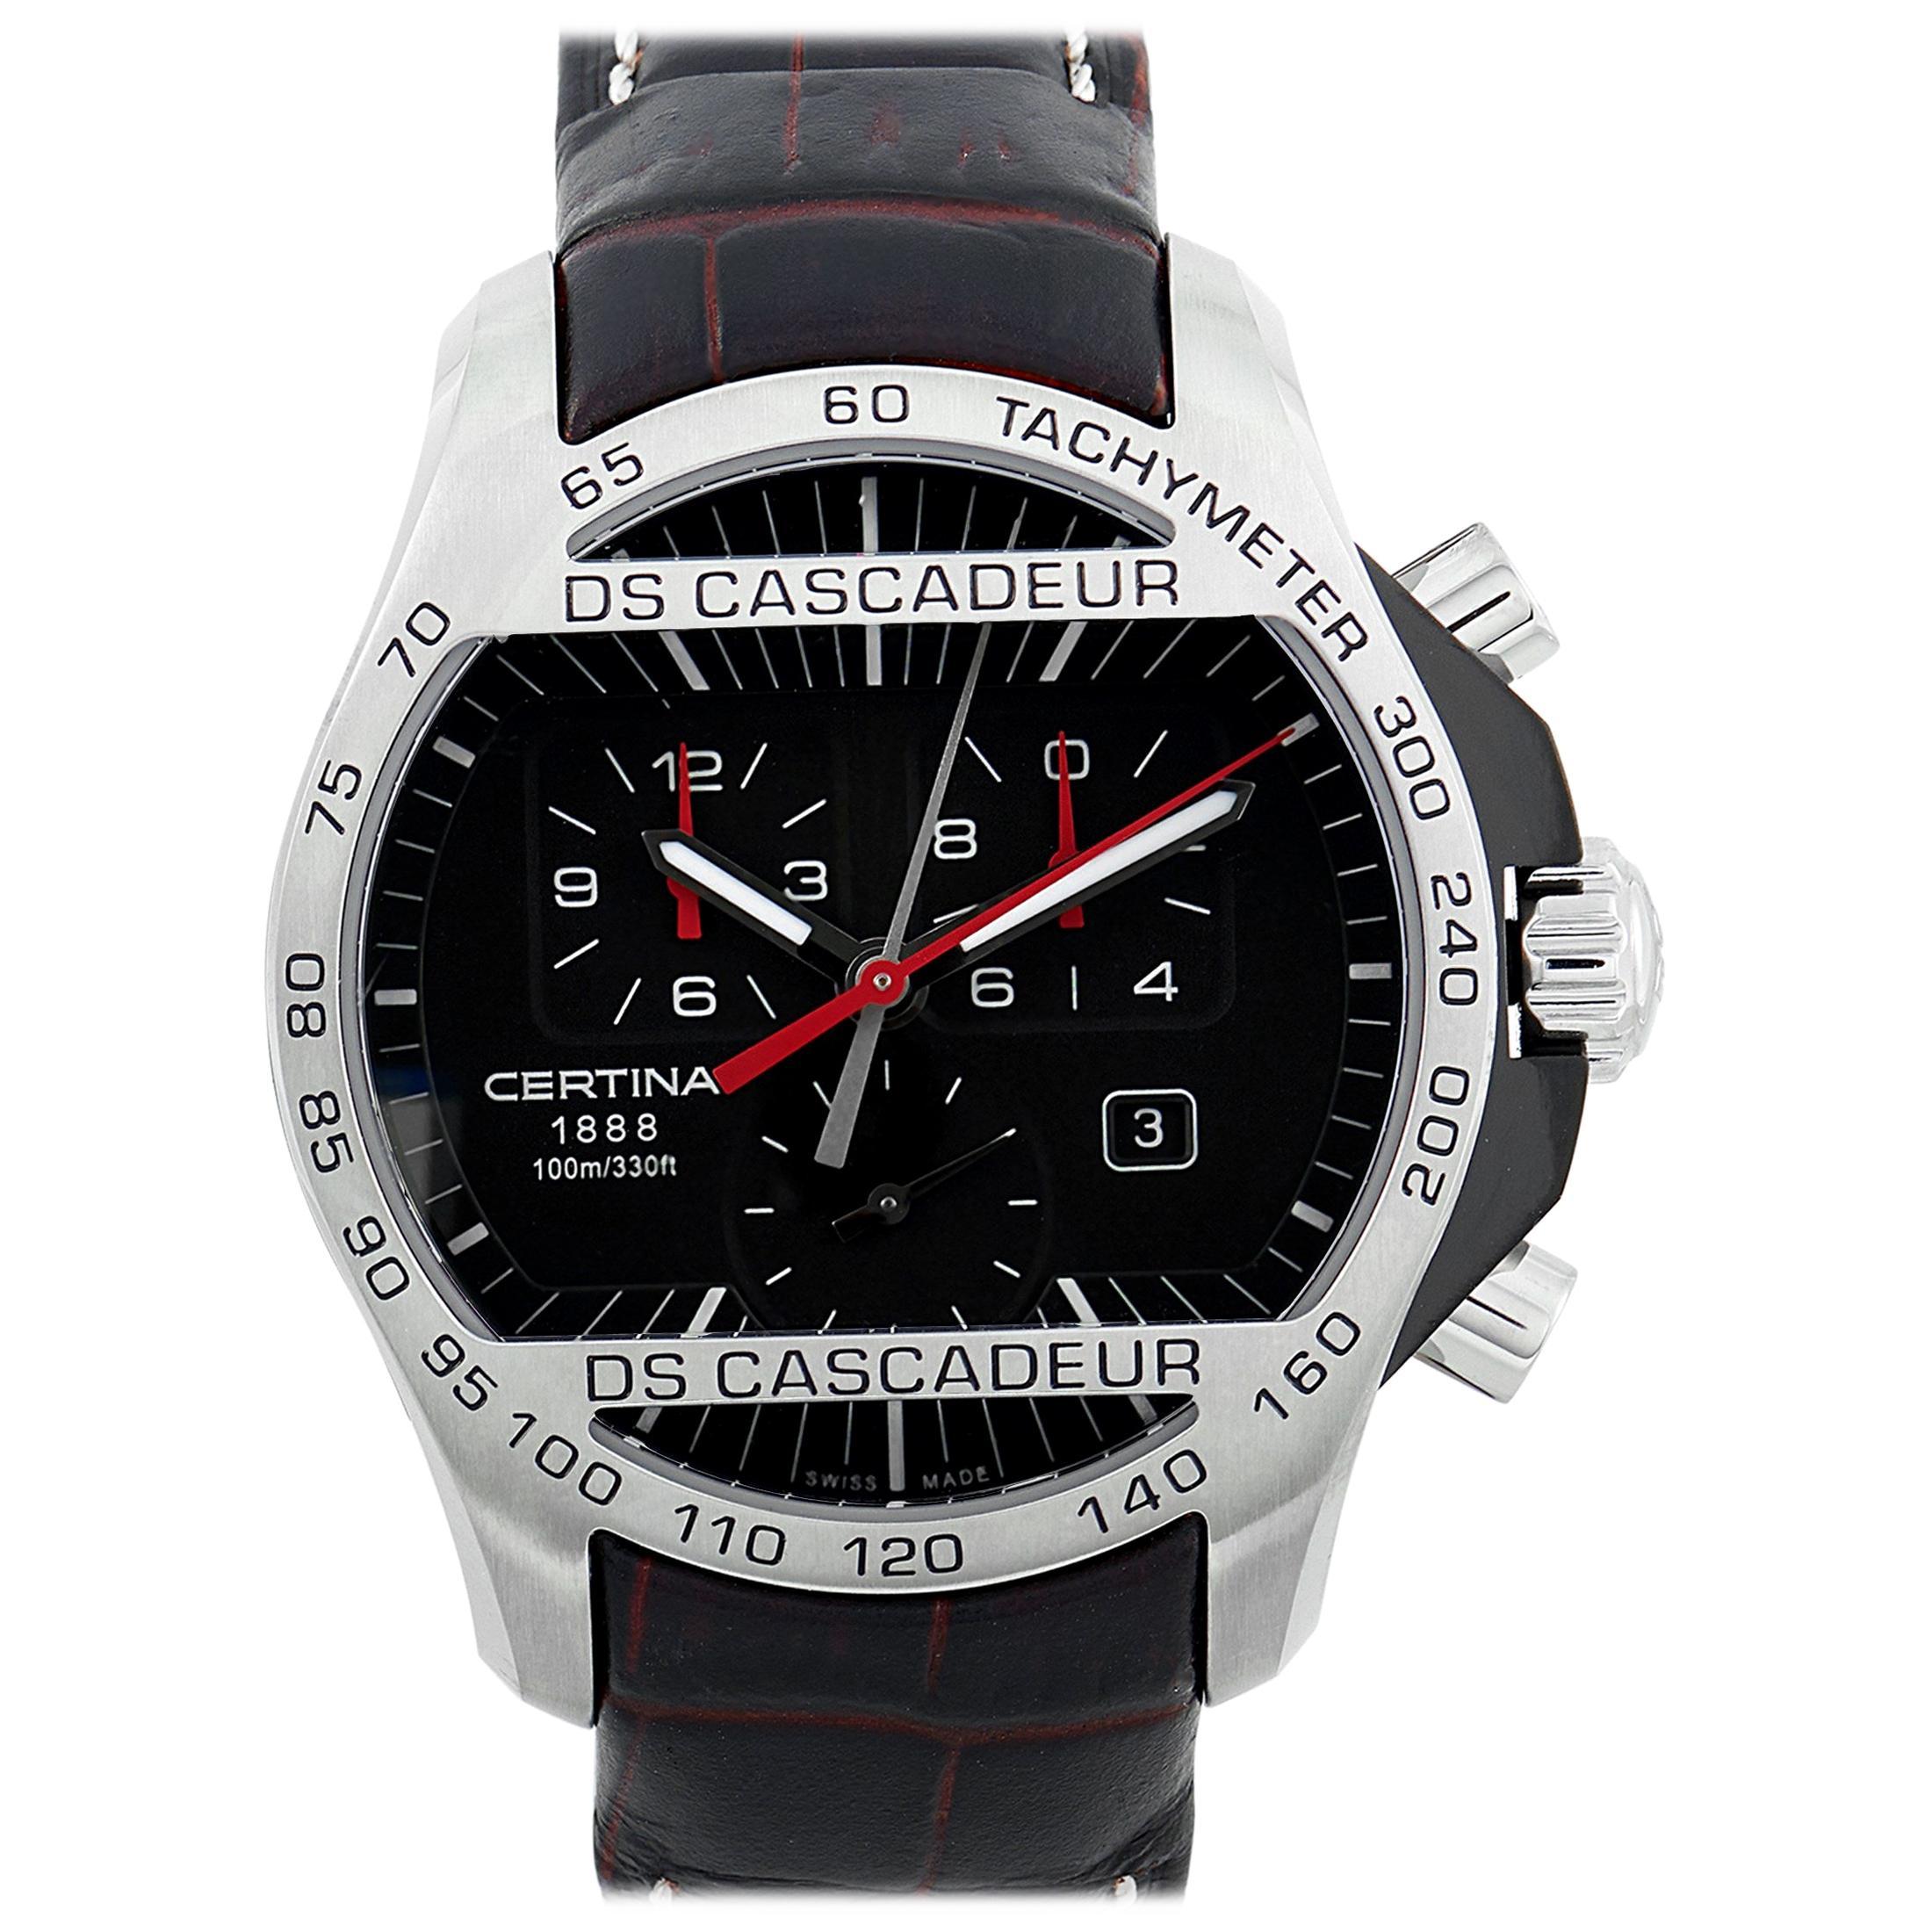 Certina DS Cascadeur Chronograph Men's Watch C003.617.26.050.00